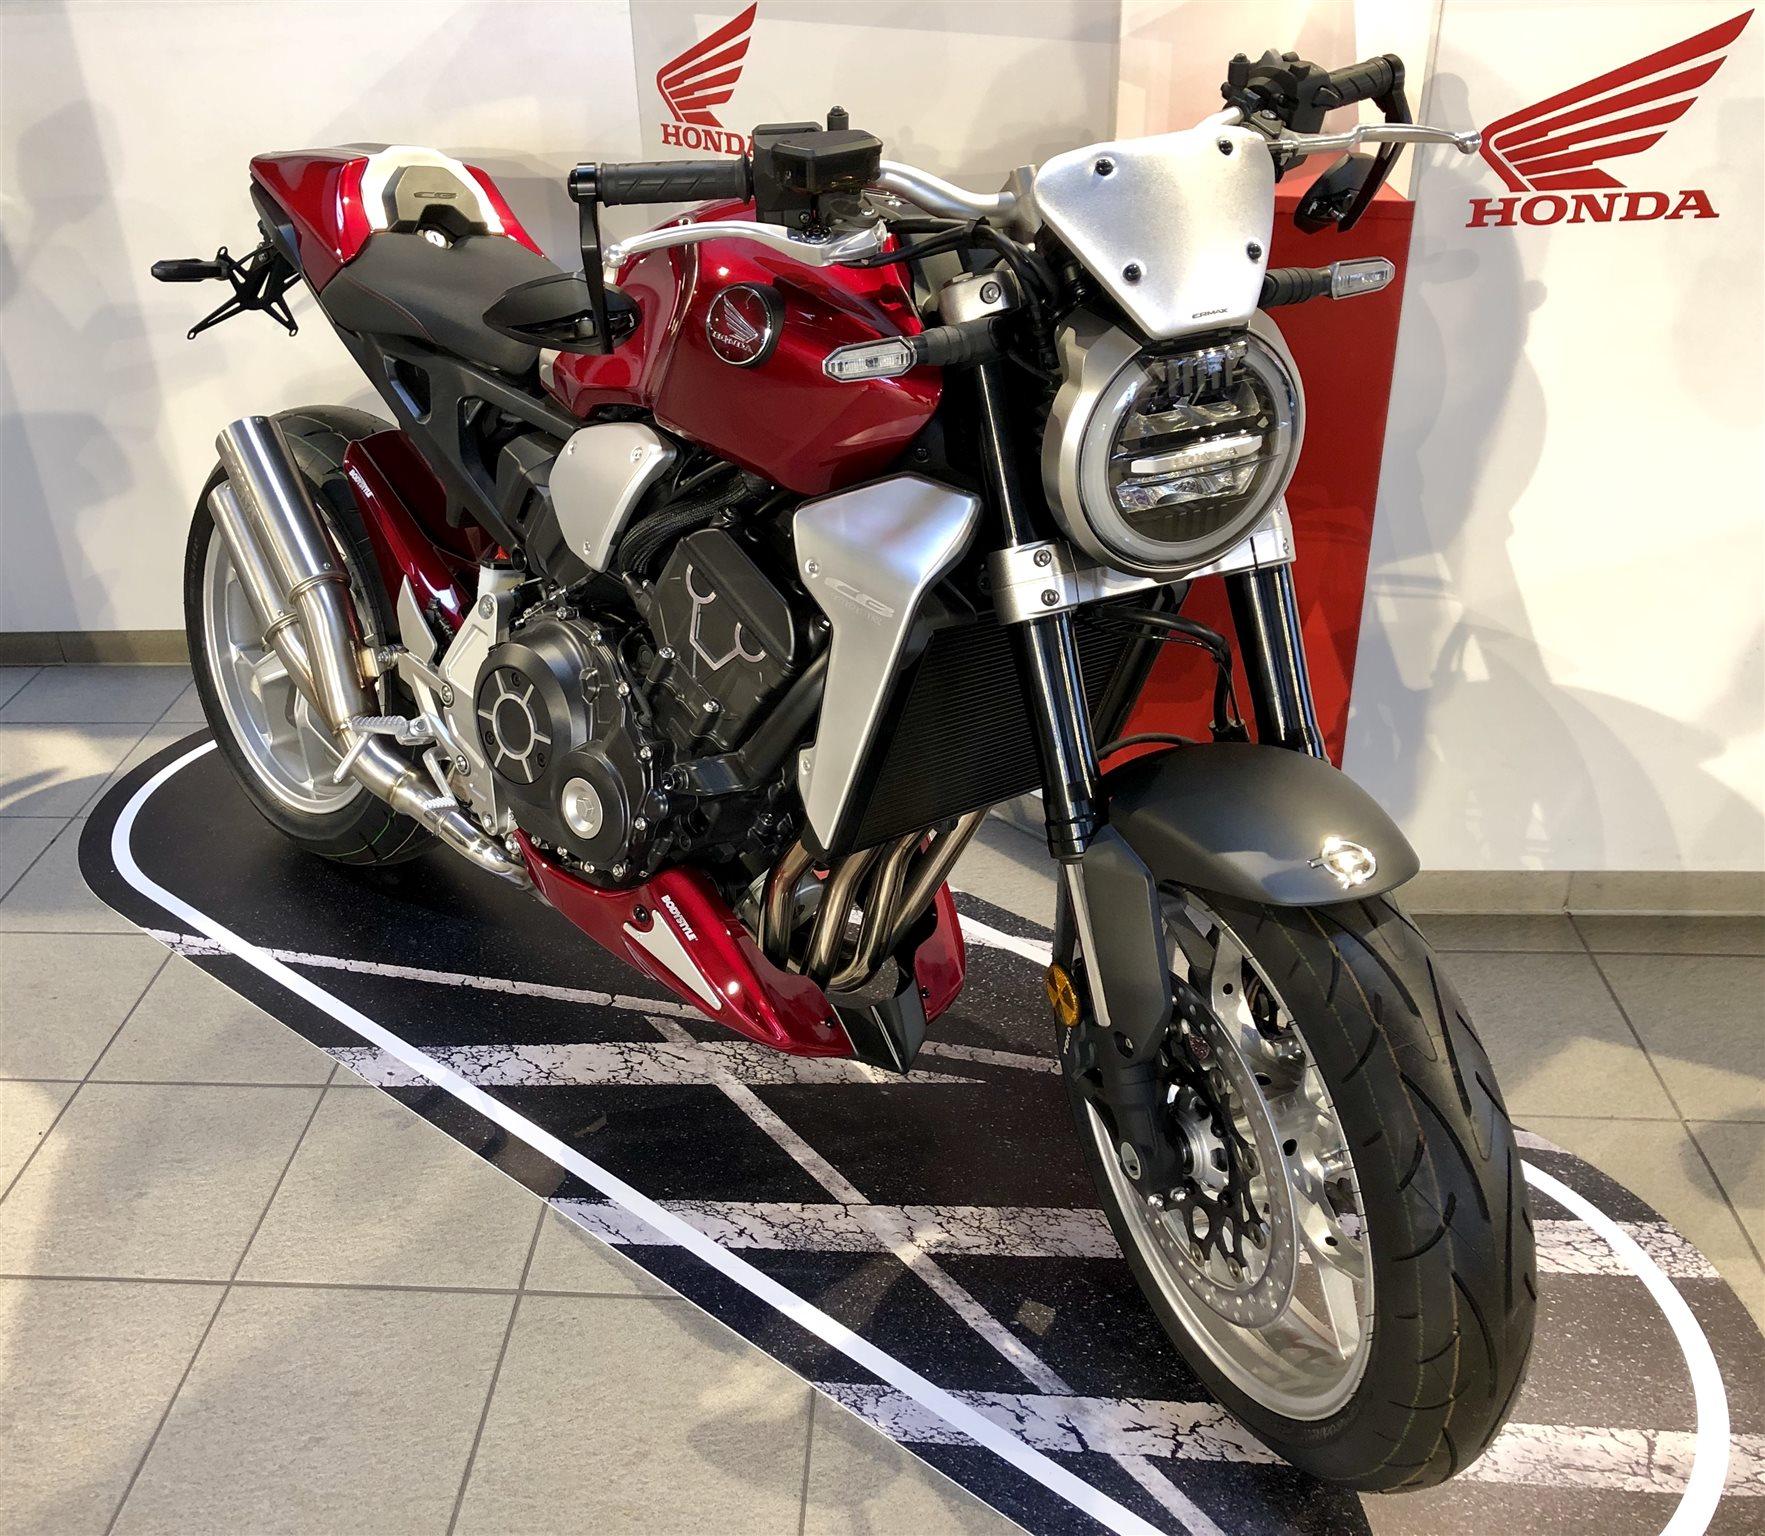 Umgebautes Motorrad Honda CB 1000 R von Auto-und